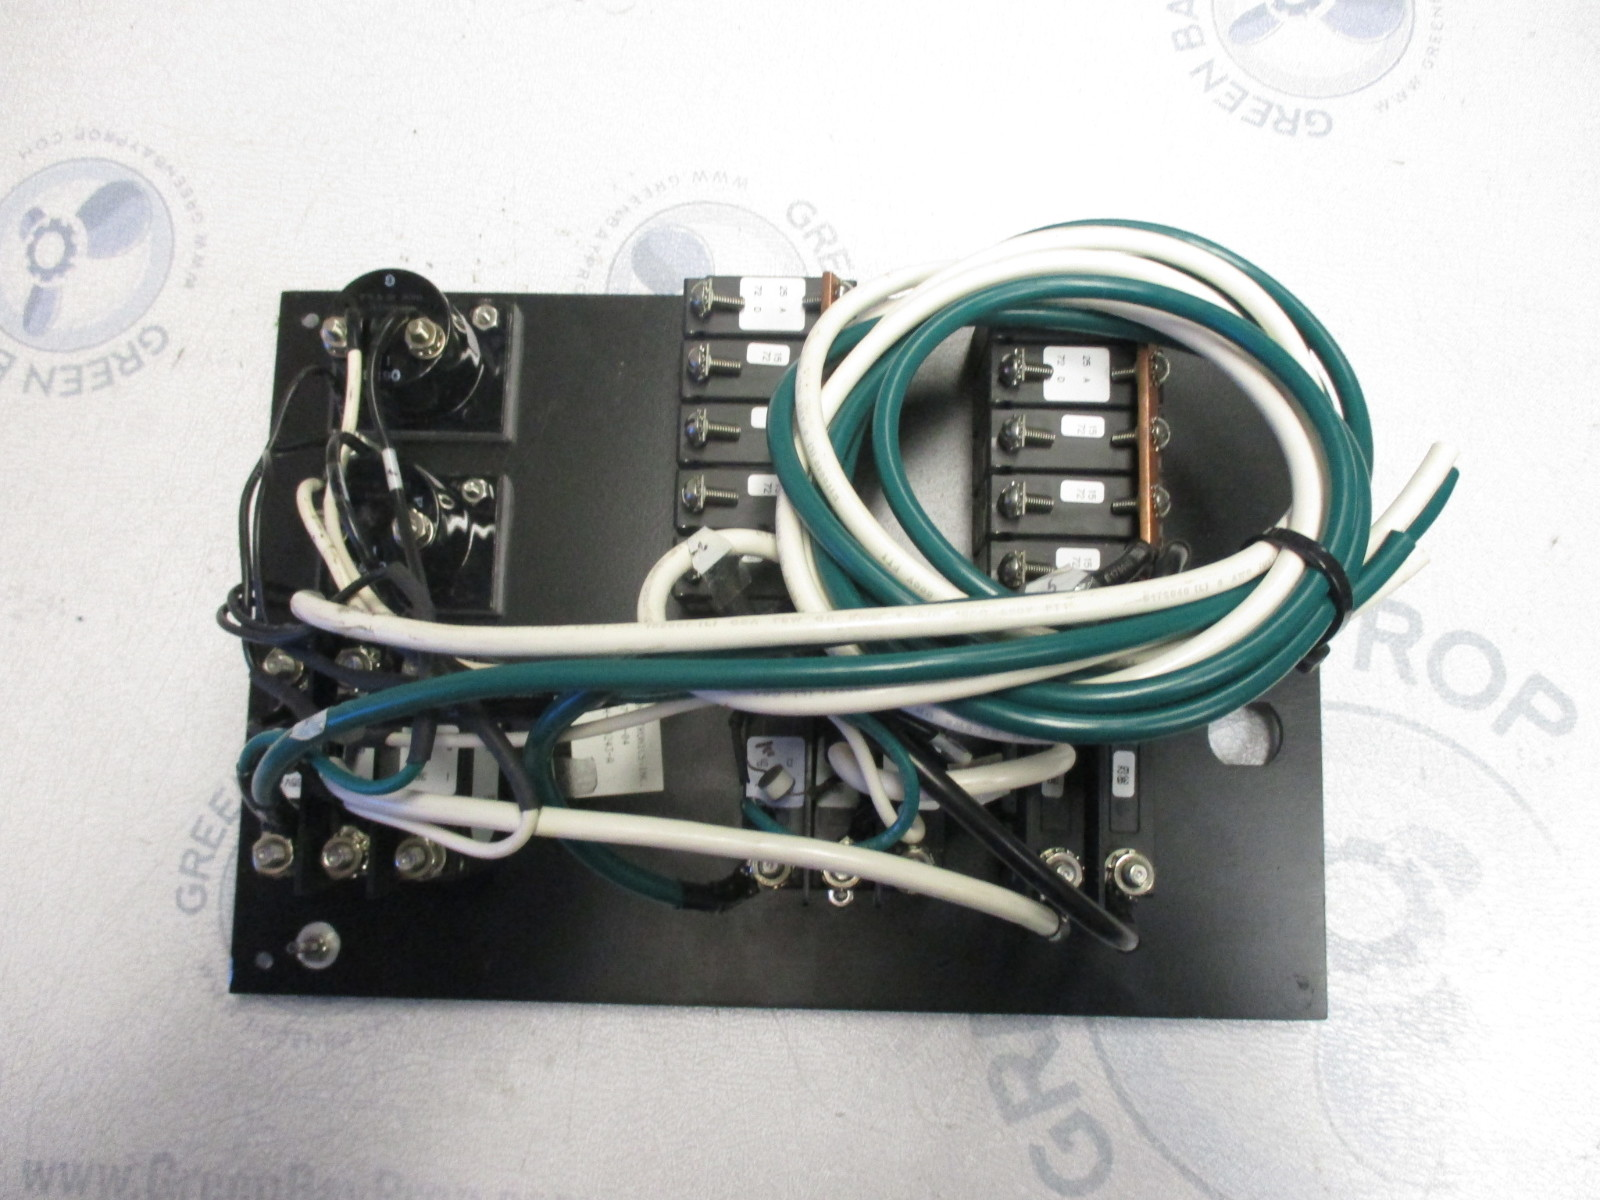 Rv Trailer Battery Wiring Diagram In Addition Tandem Axle Boat Trailer